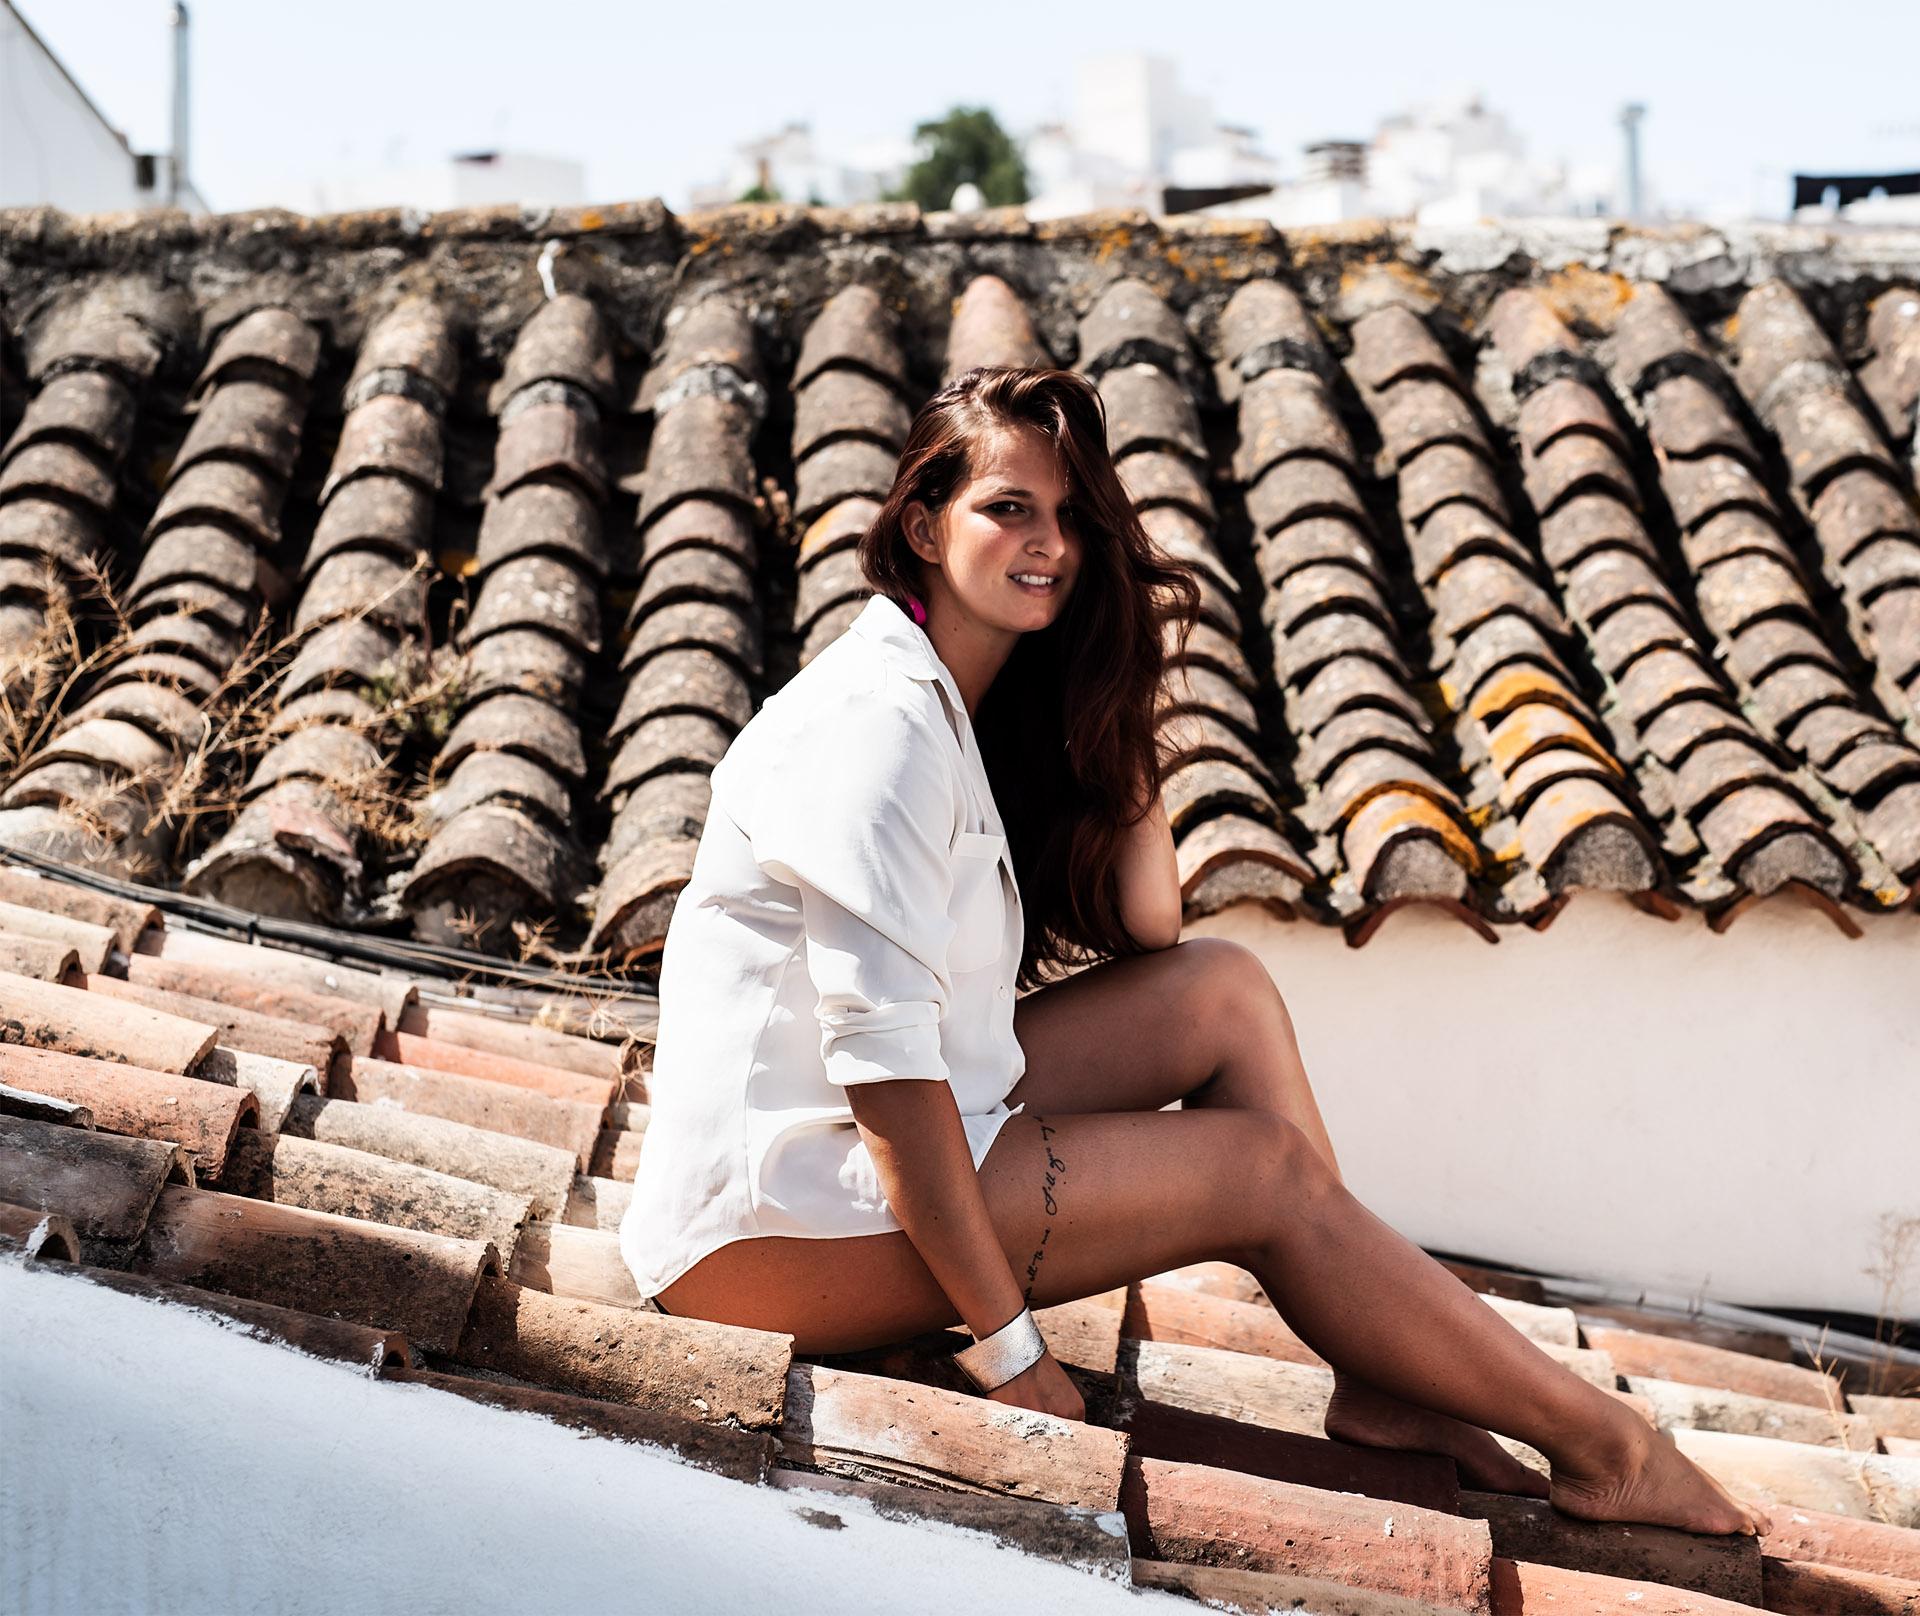 roof-of-almunecar